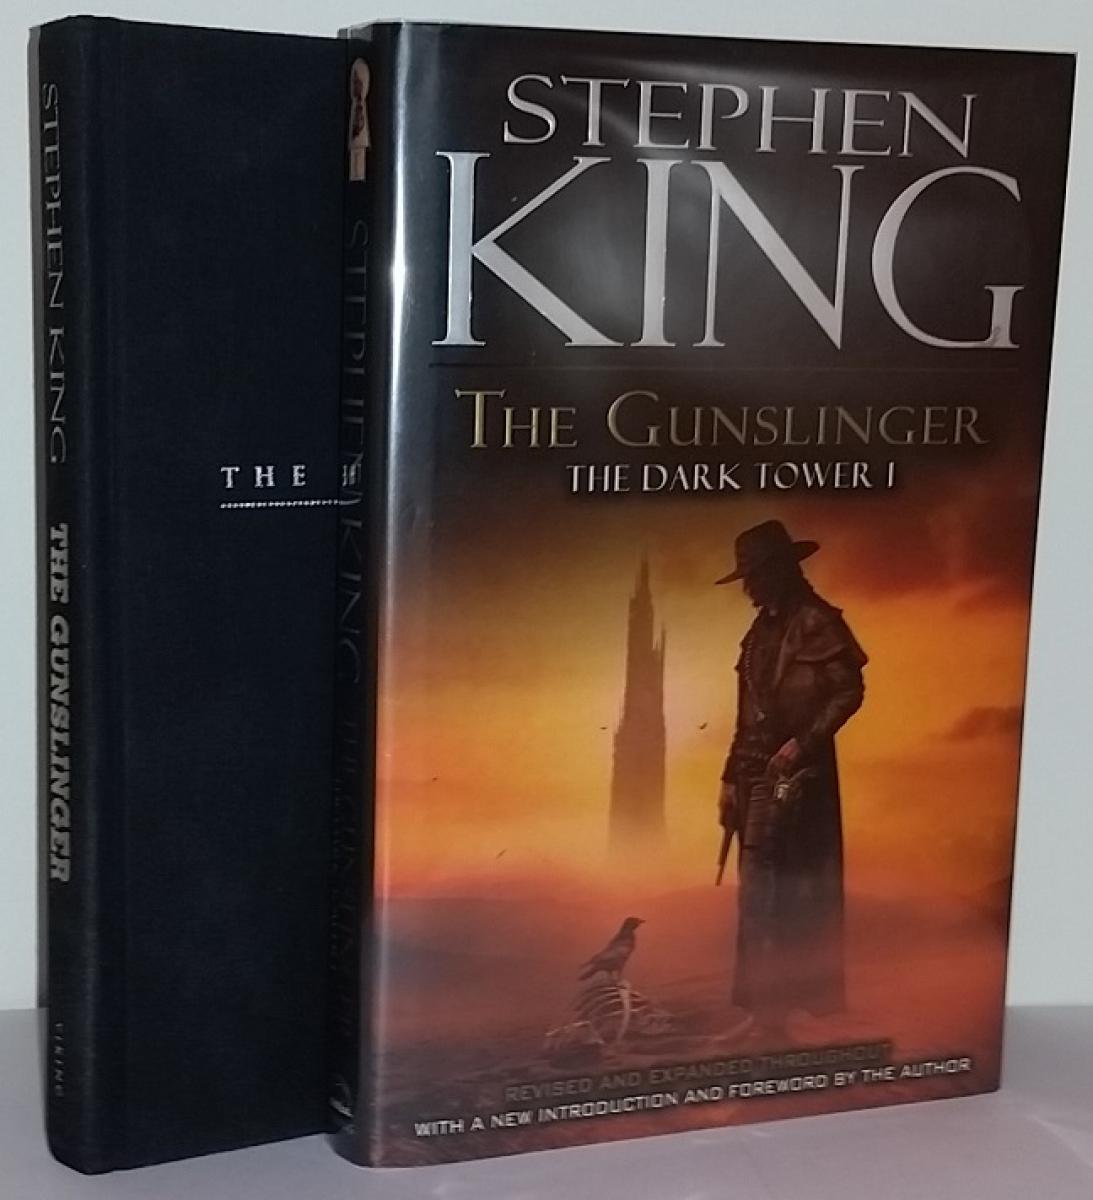 """The Dark Tower I: The Gunslinger"" wersja z 2003 roku - książka i obwoluta - obrazek"